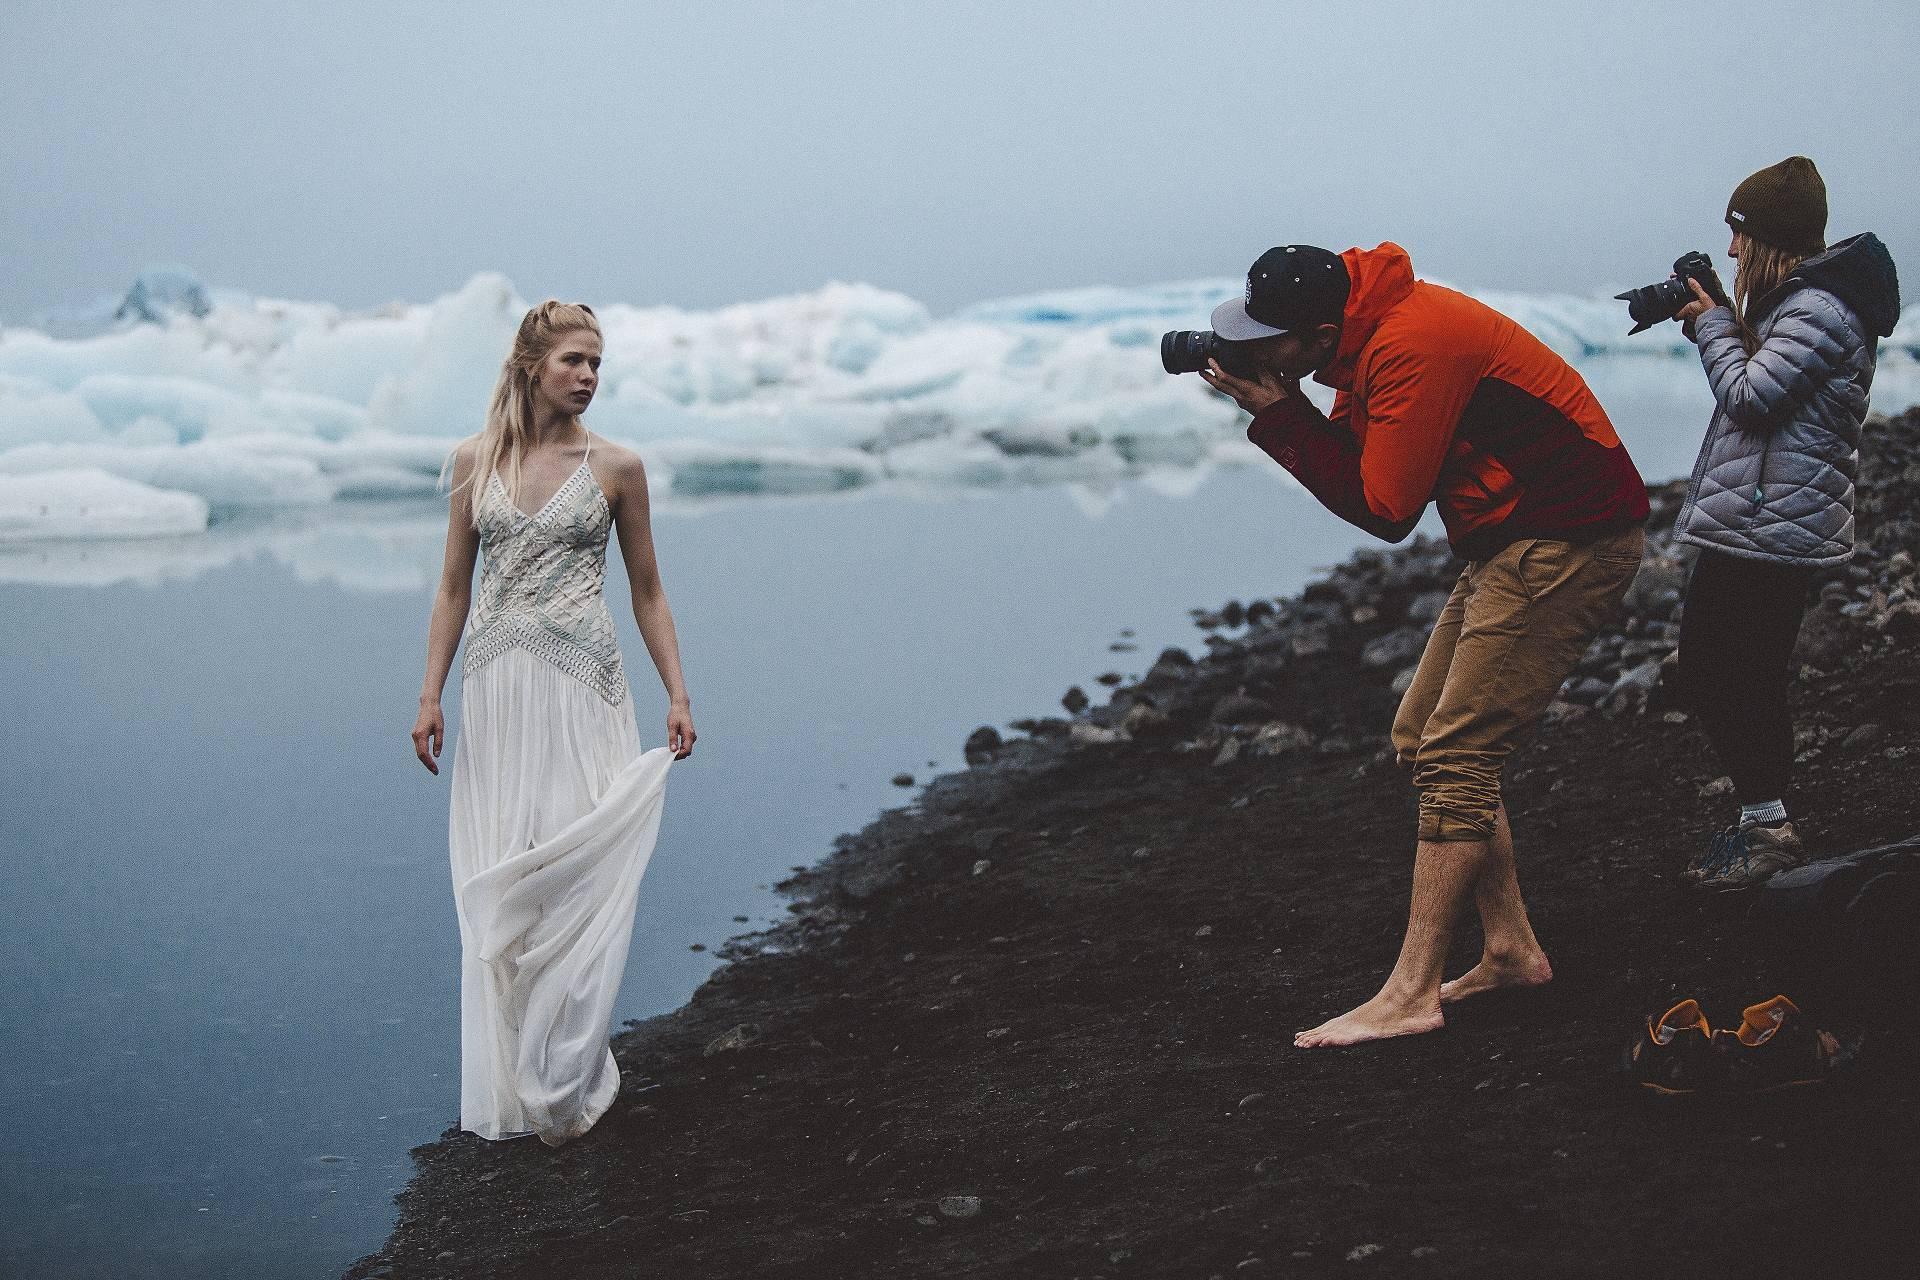 Bud-johnson-iceland-photos0020.jpg